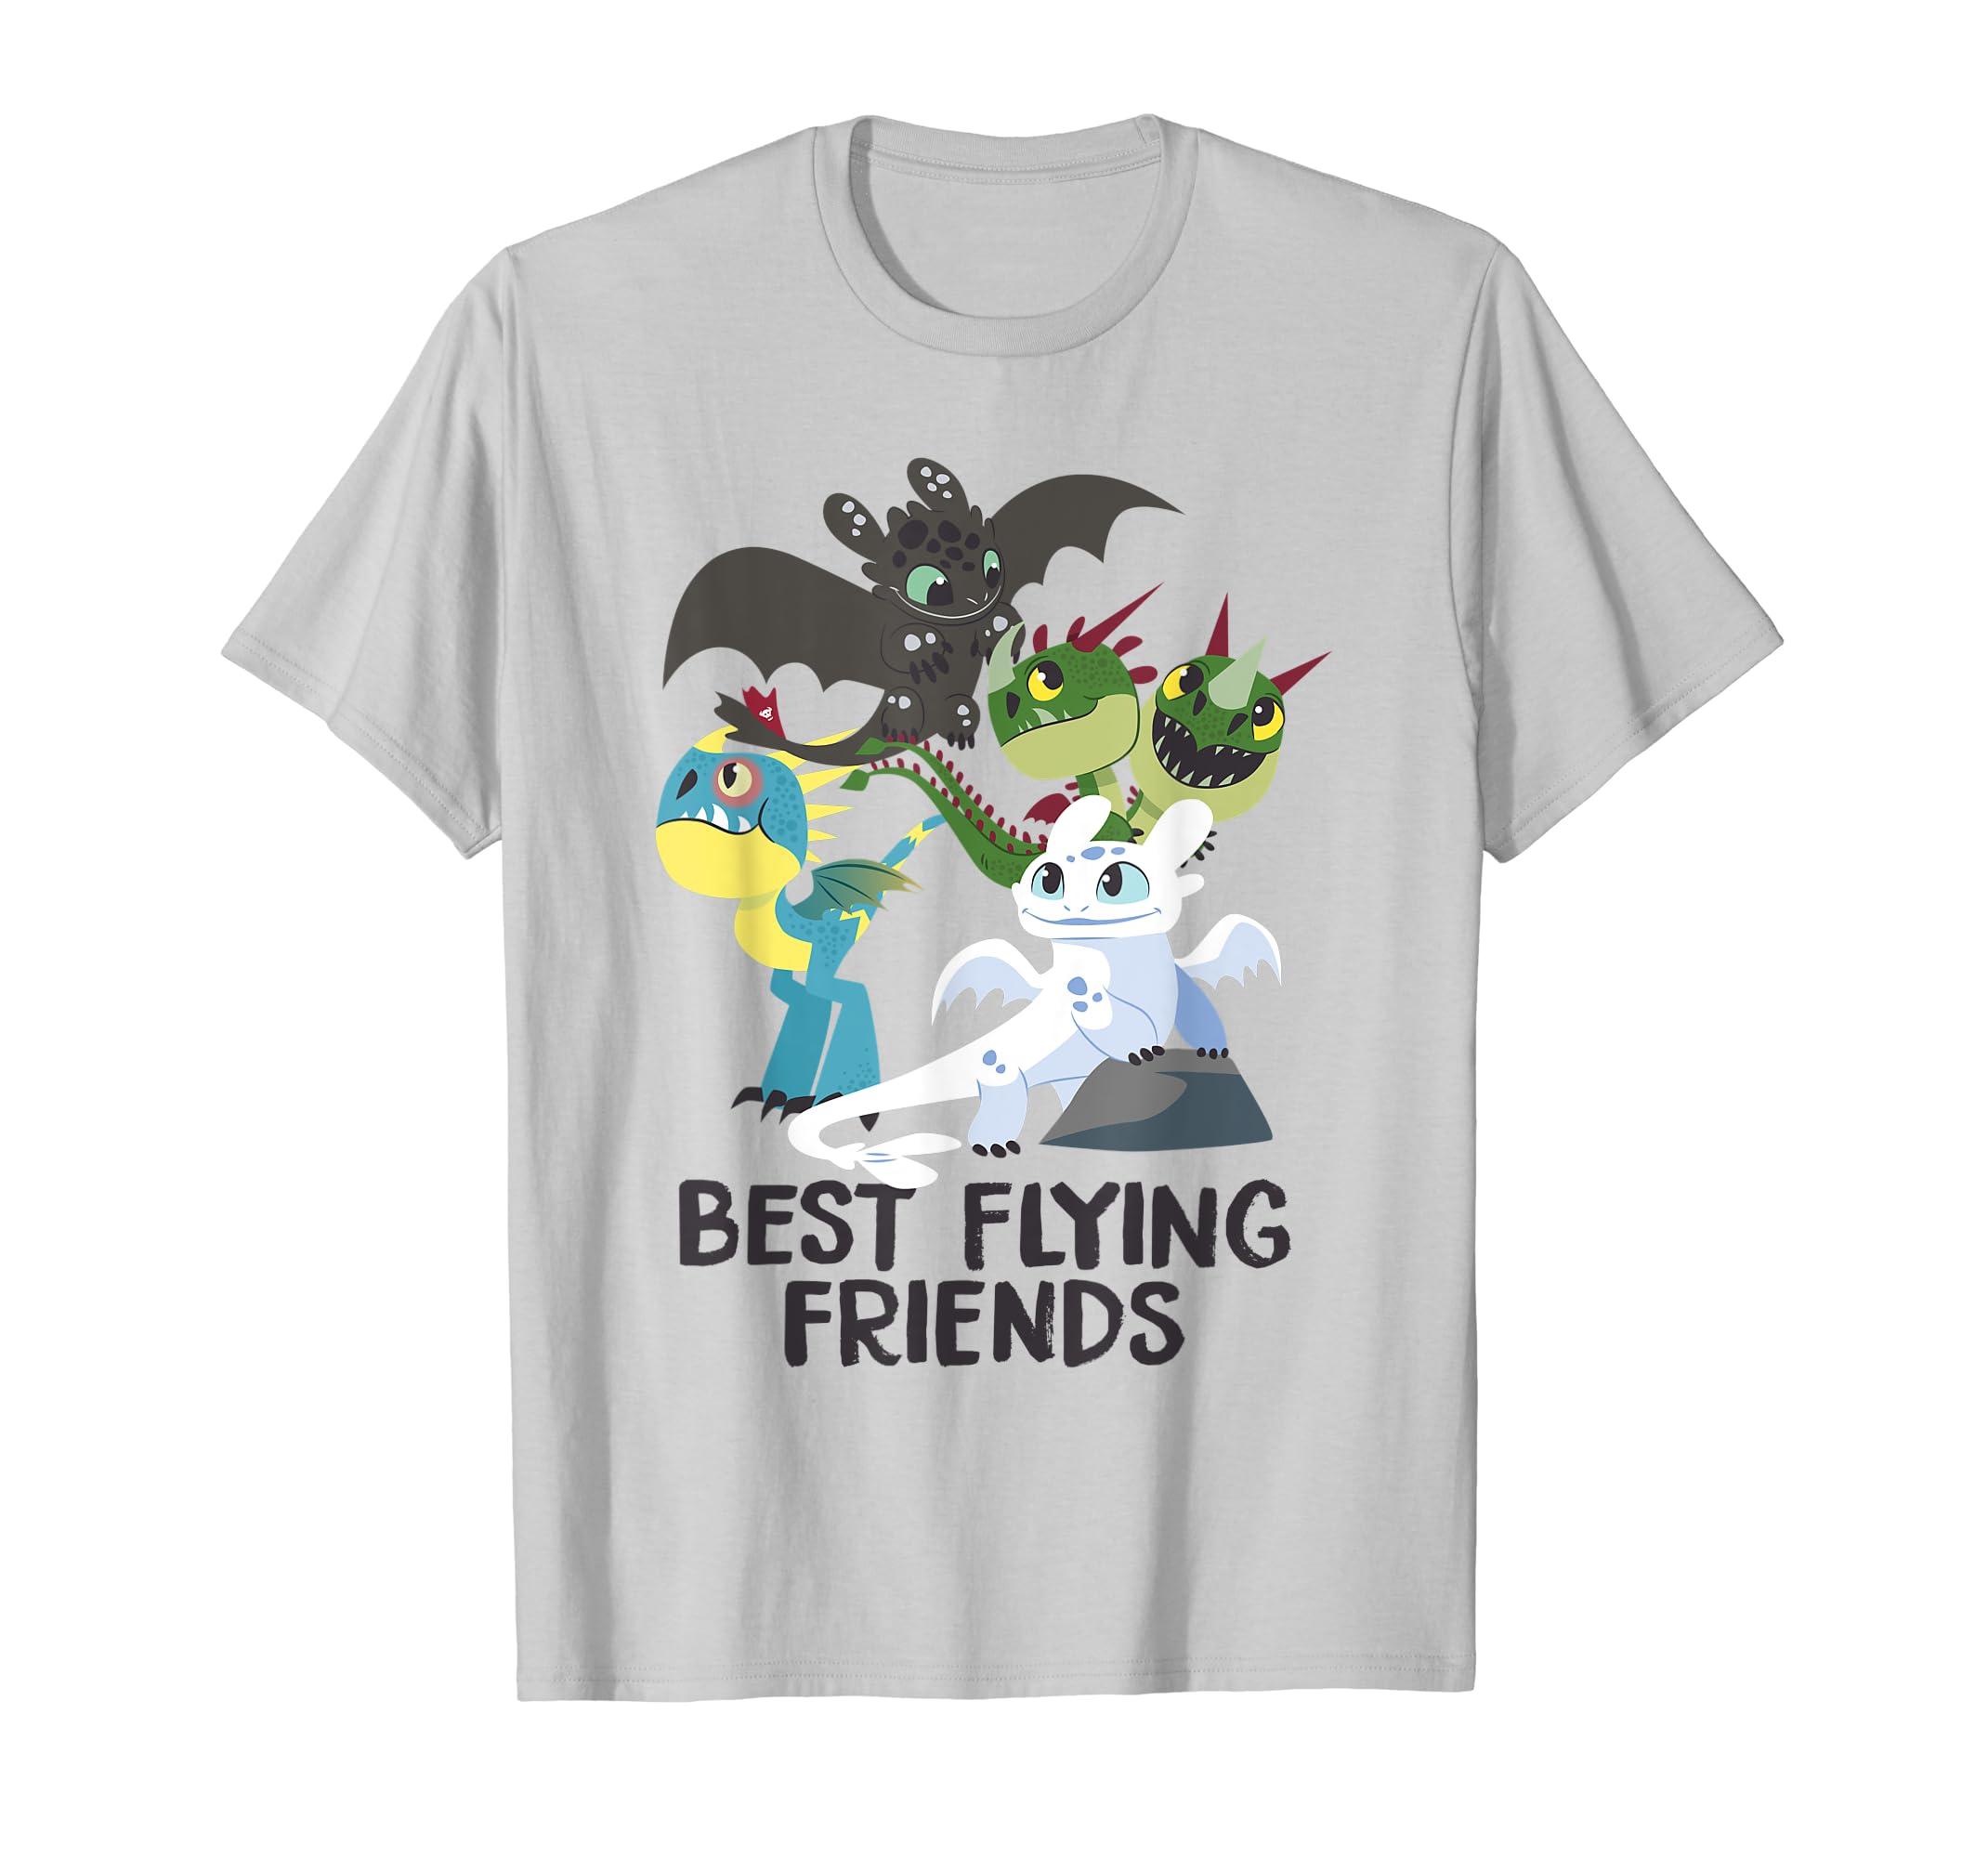 cb9611b3 Amazon.com: DreamWorks How To Train Your Dragon 3 Best Friends T-shirt:  Clothing